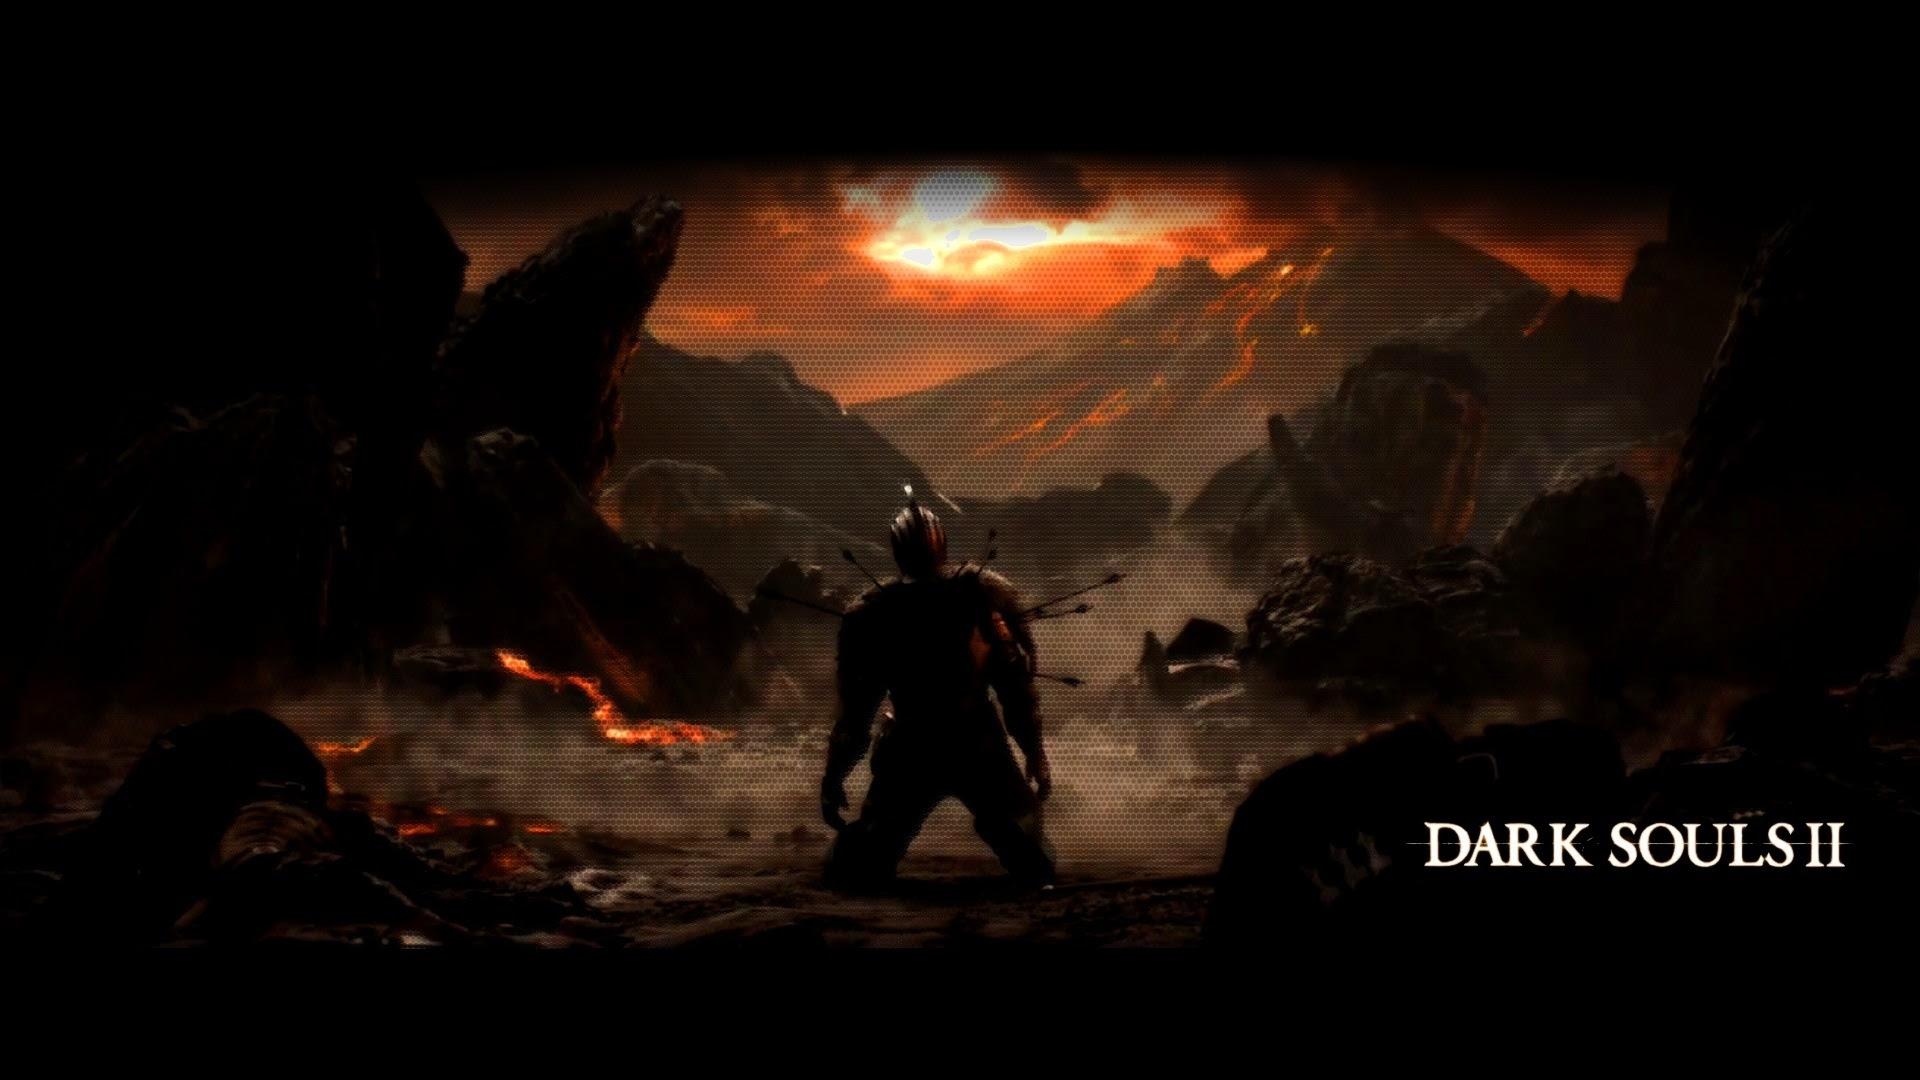 Dark Souls 2 Game Hd Wallpapers 4 1920x1080 Wallpaper Download